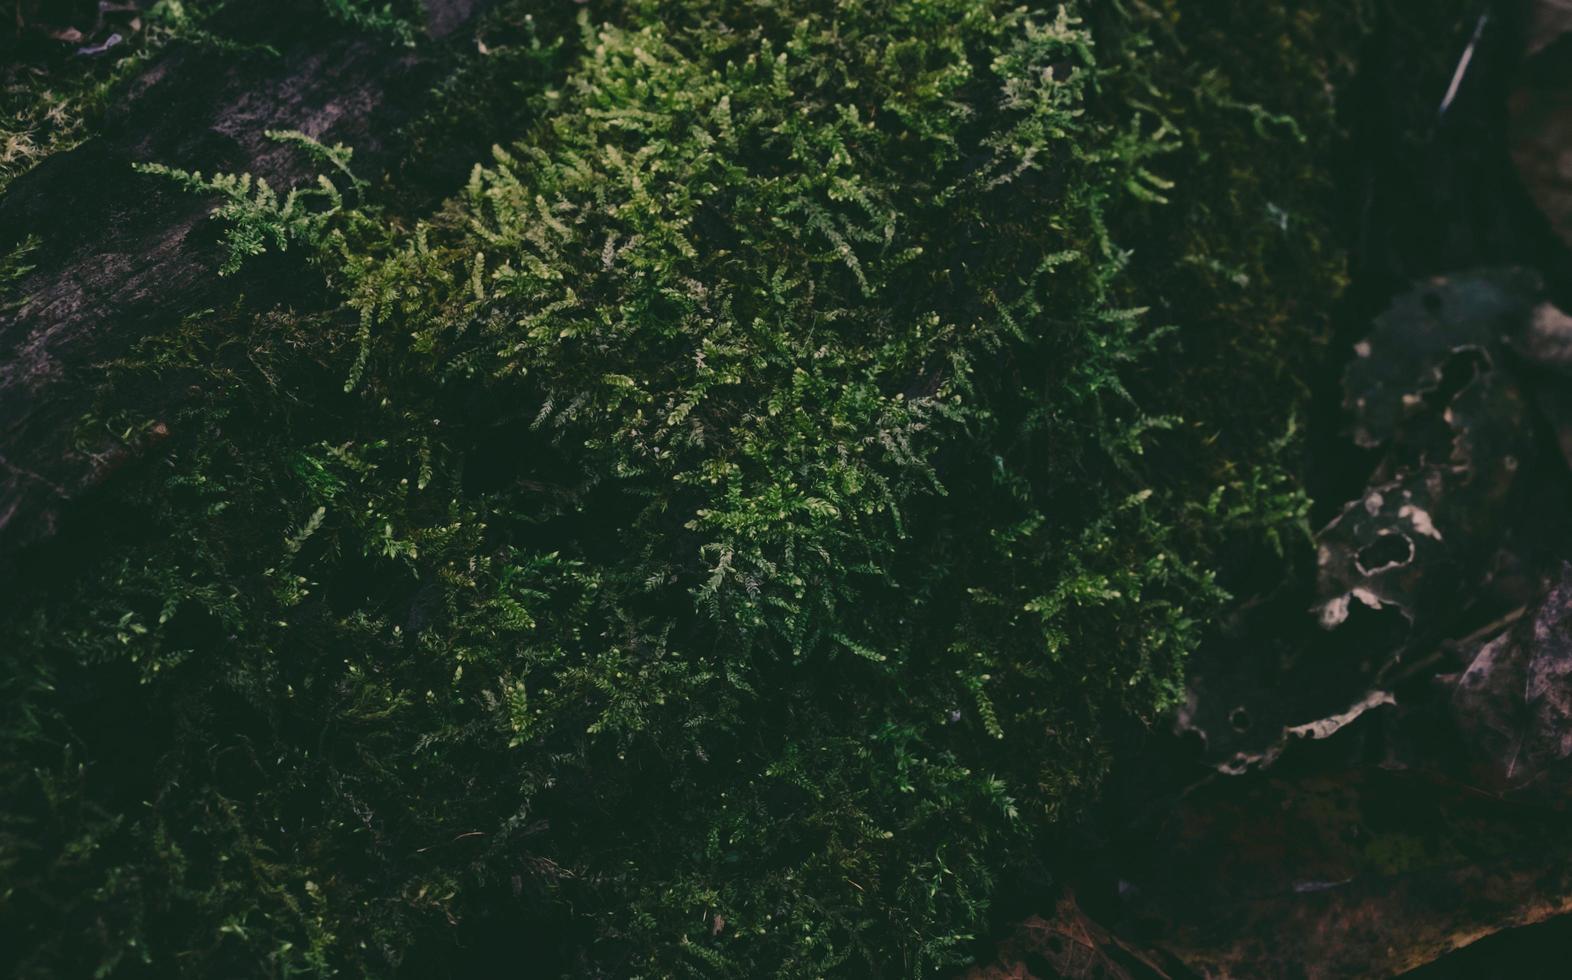 groene struik in het bos foto